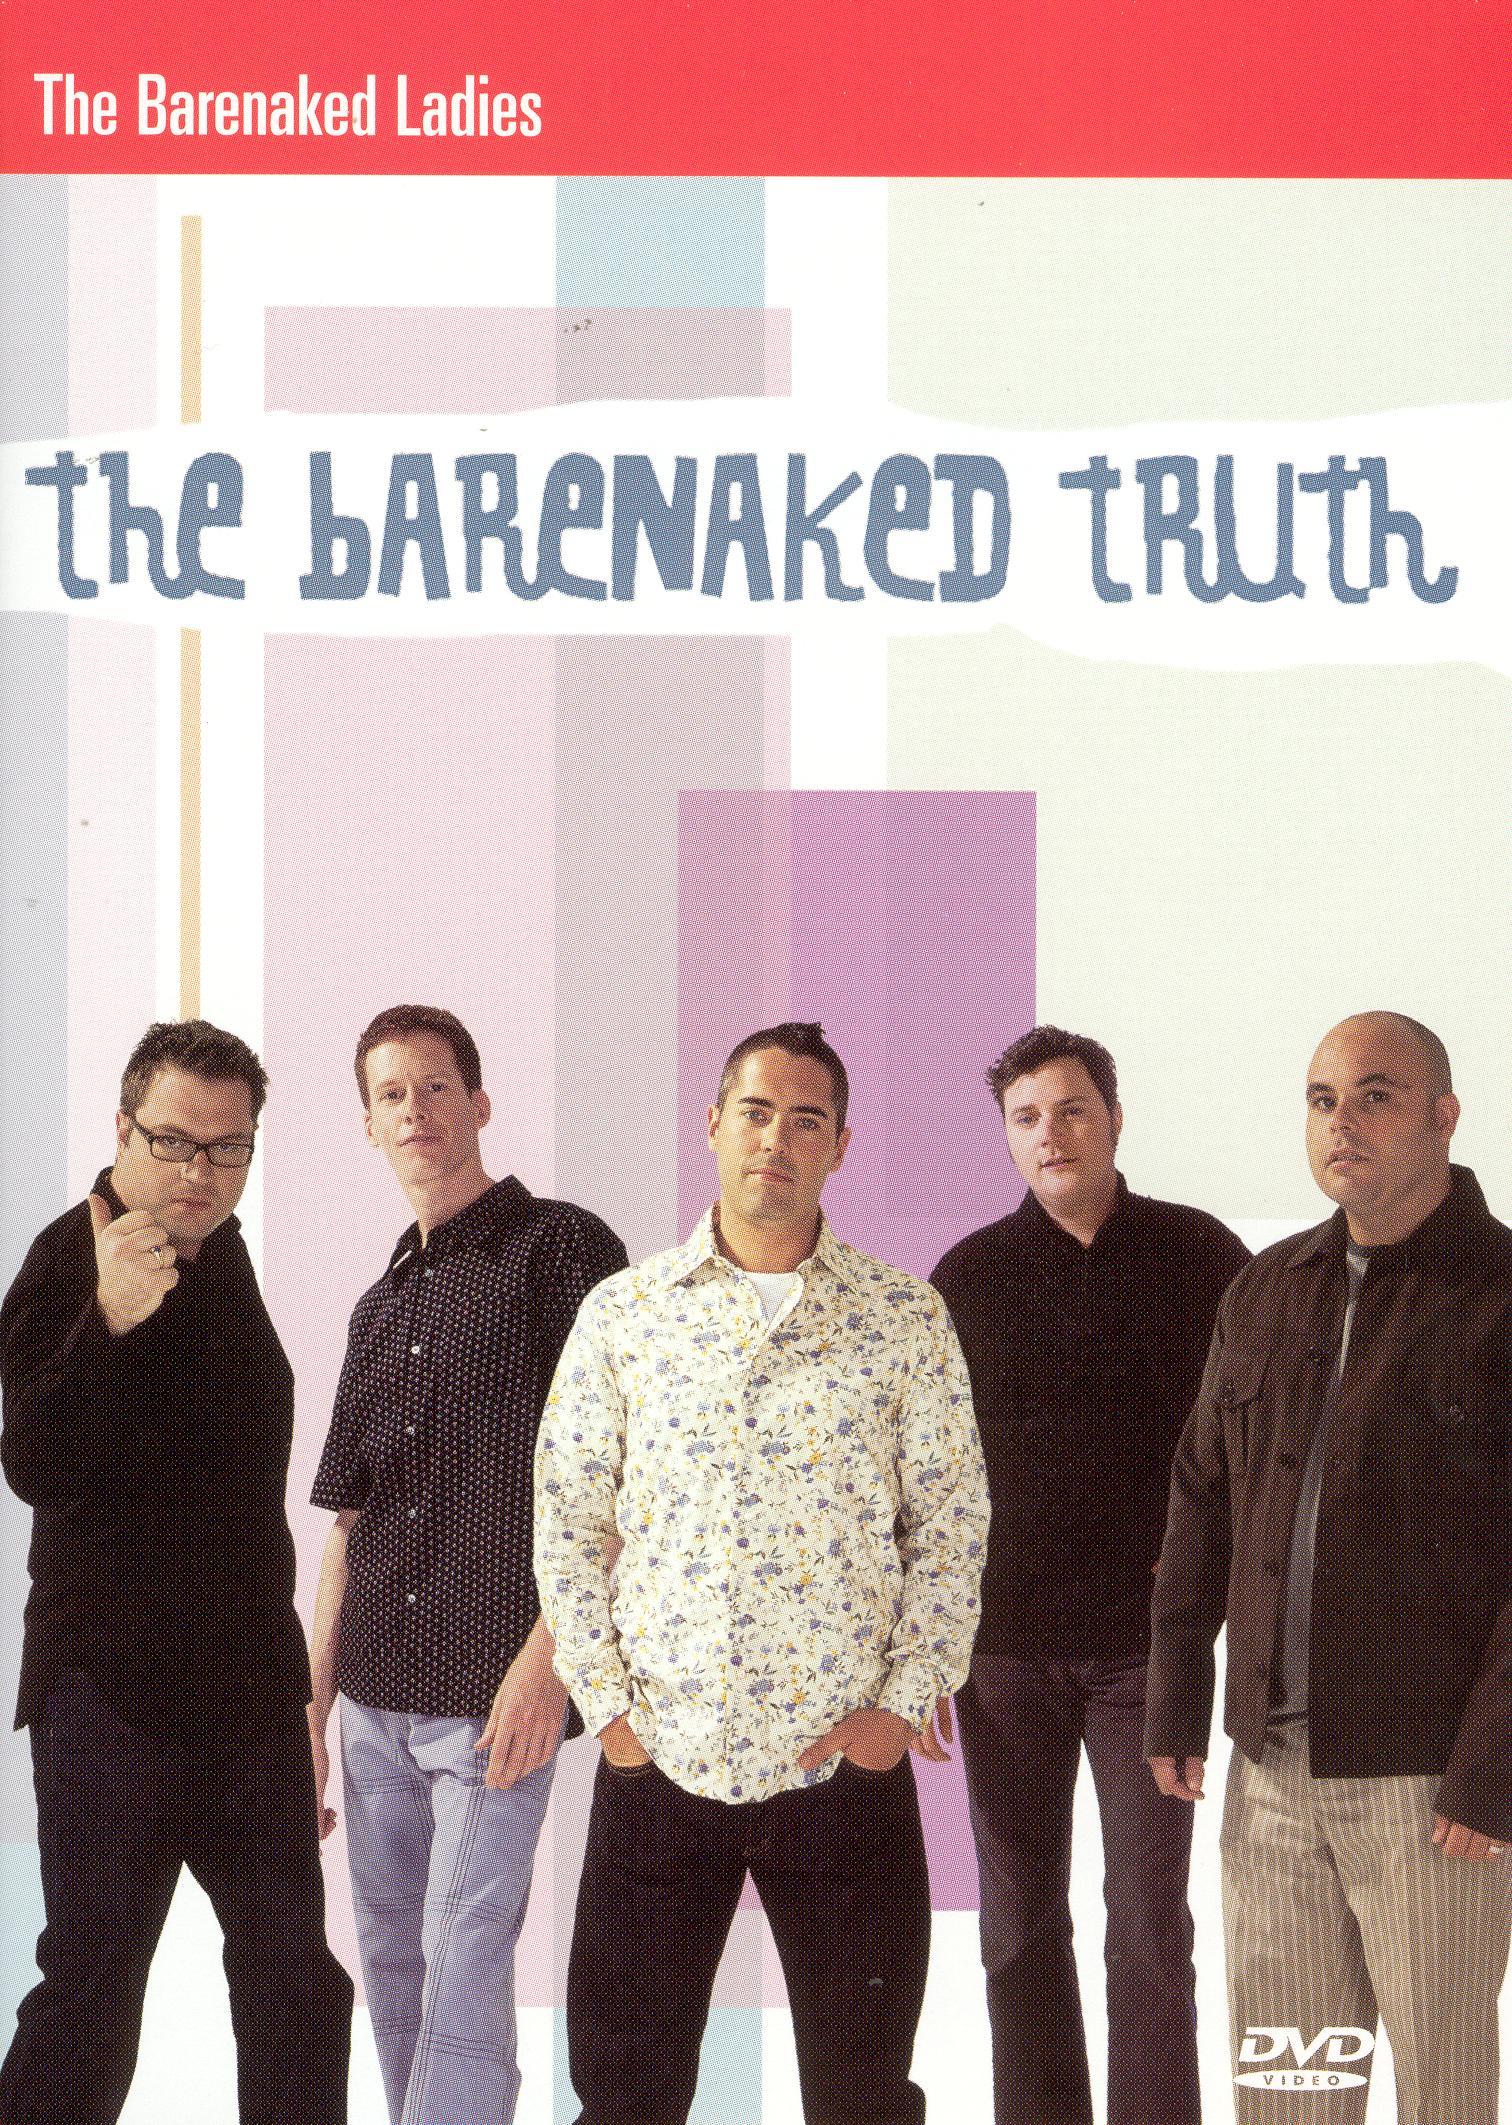 Barenaked Ladies: Barenaked Truth